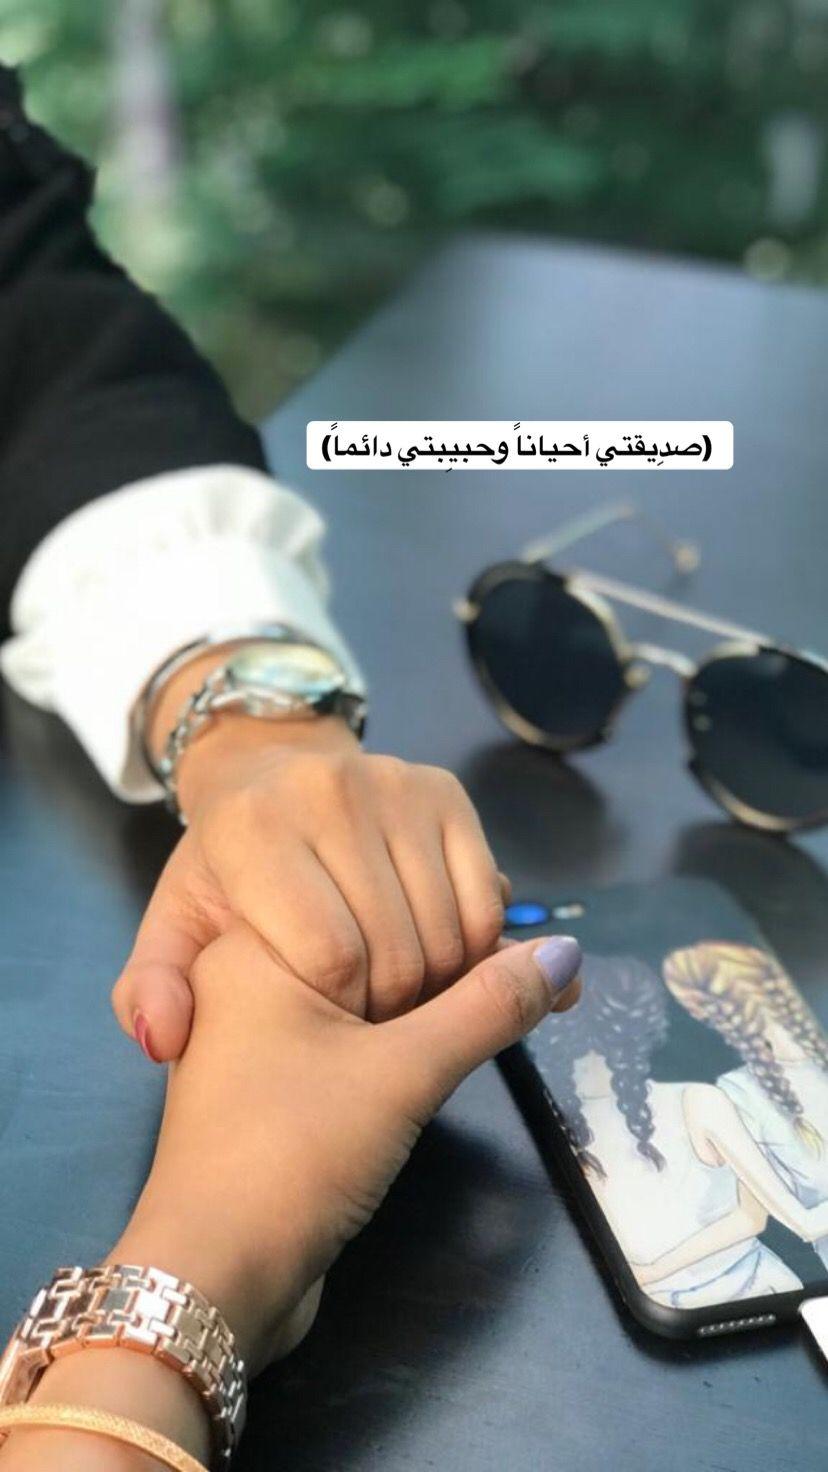 Pin By سارة خالد احمد علي الصريمي On Snap Alaa Alabad تصوير يوميات الجامعة اقتباسات عبارات Cute Love Images Love Quotes Wallpaper Beautiful Arabic Words